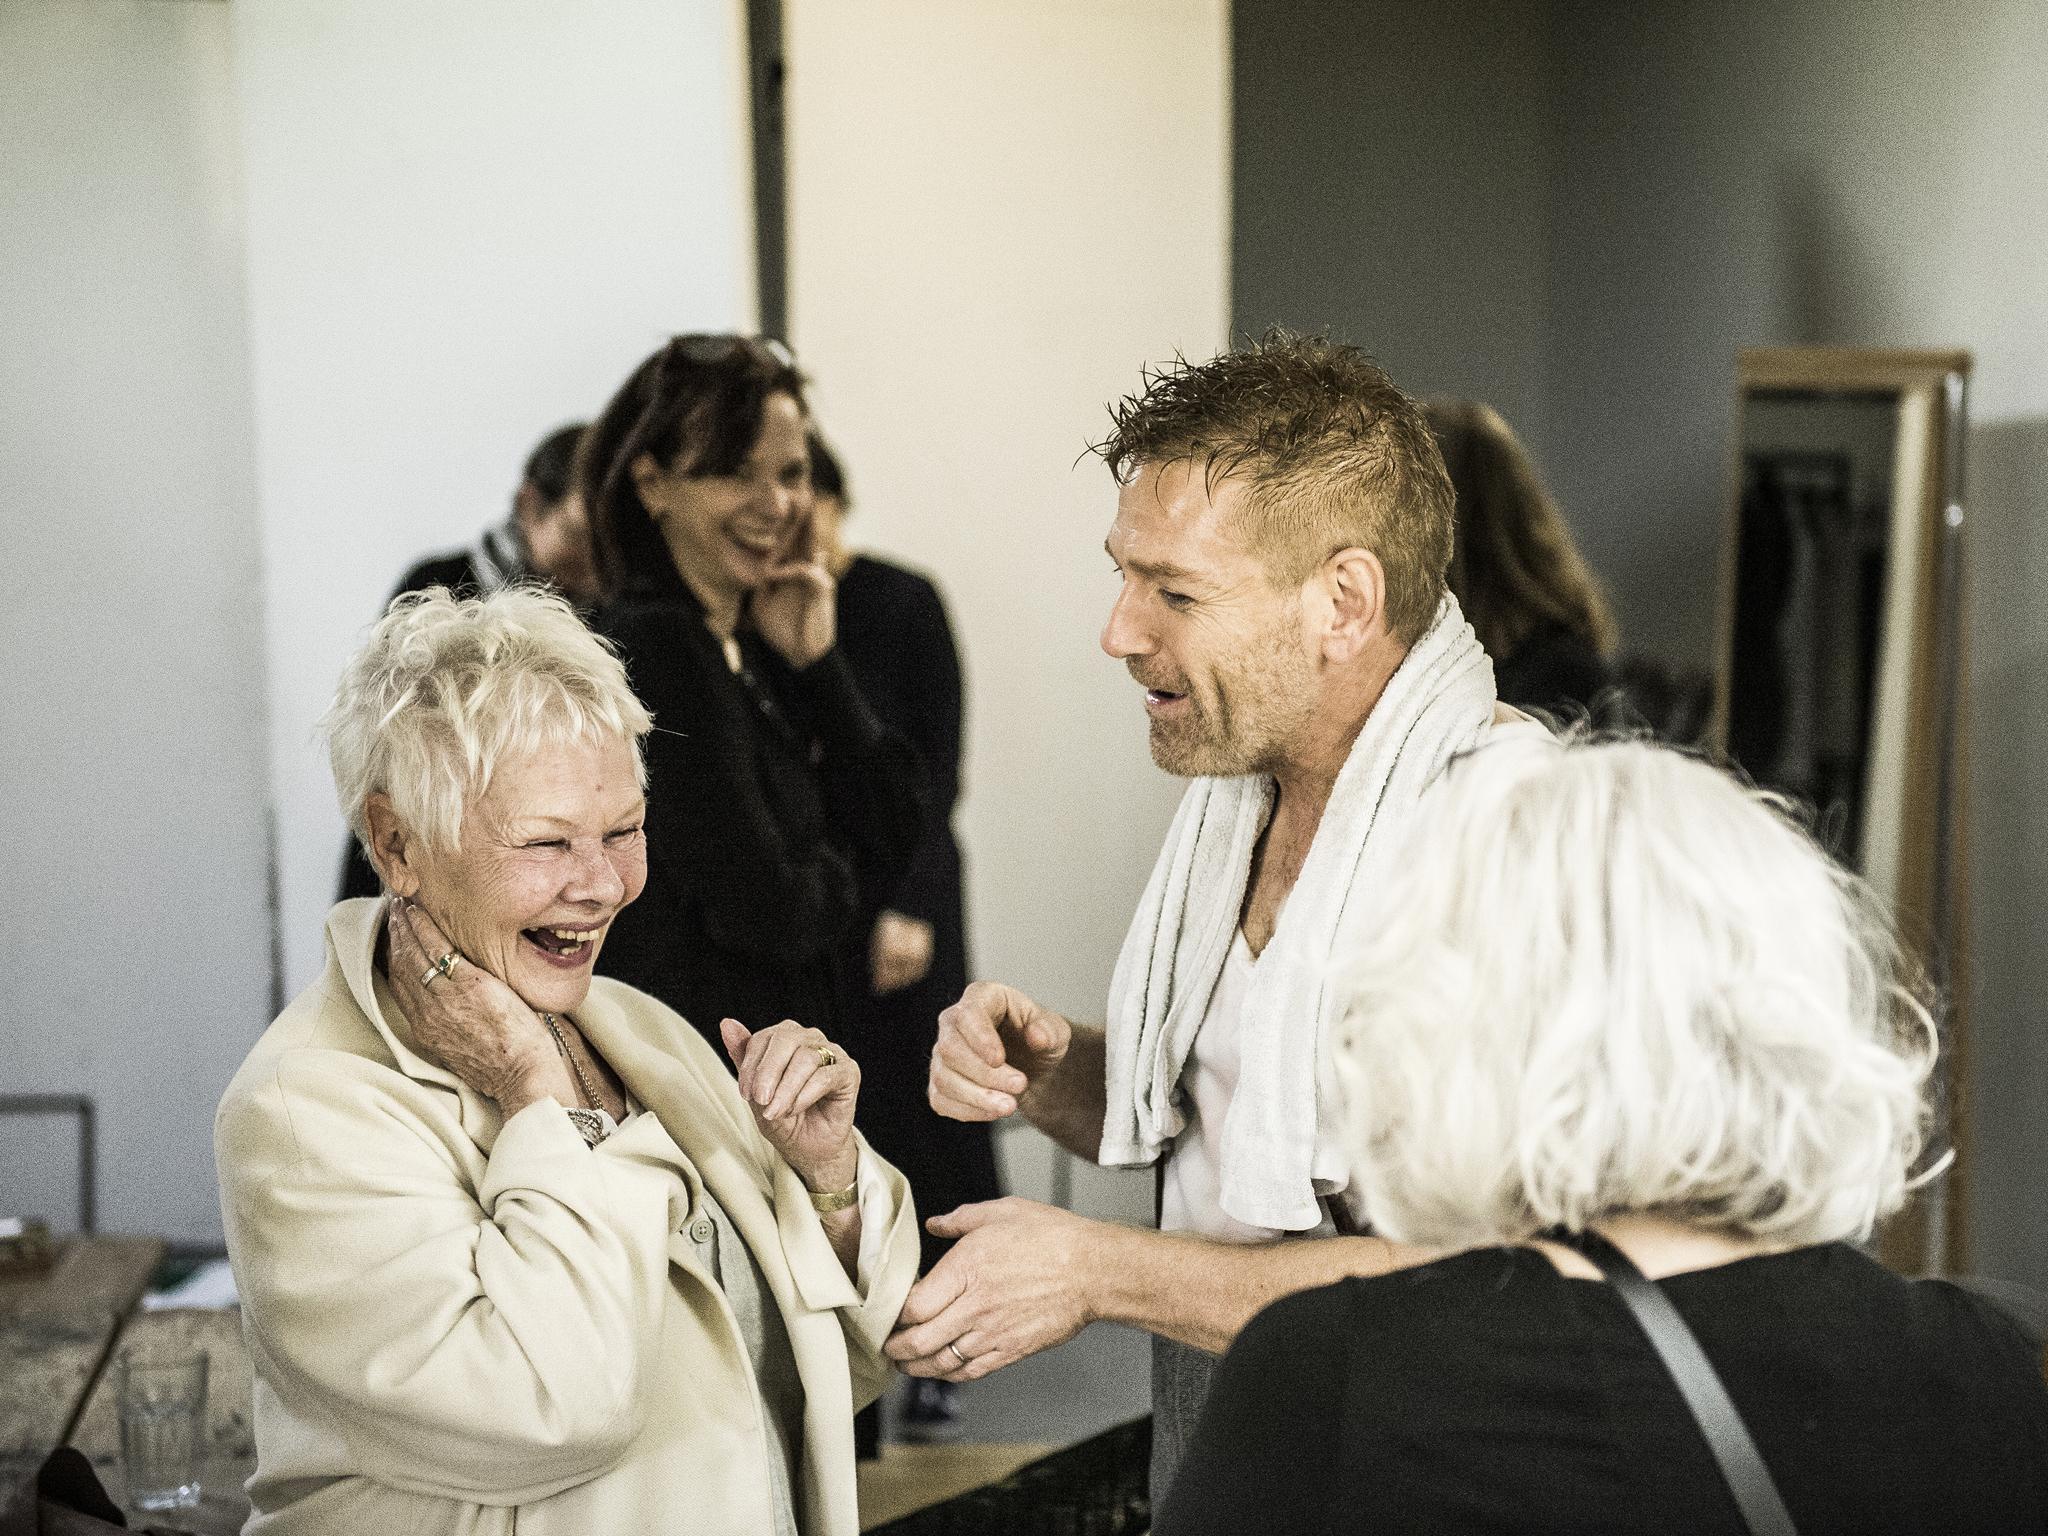 Kenneth Branagh and Judi Dench backstage